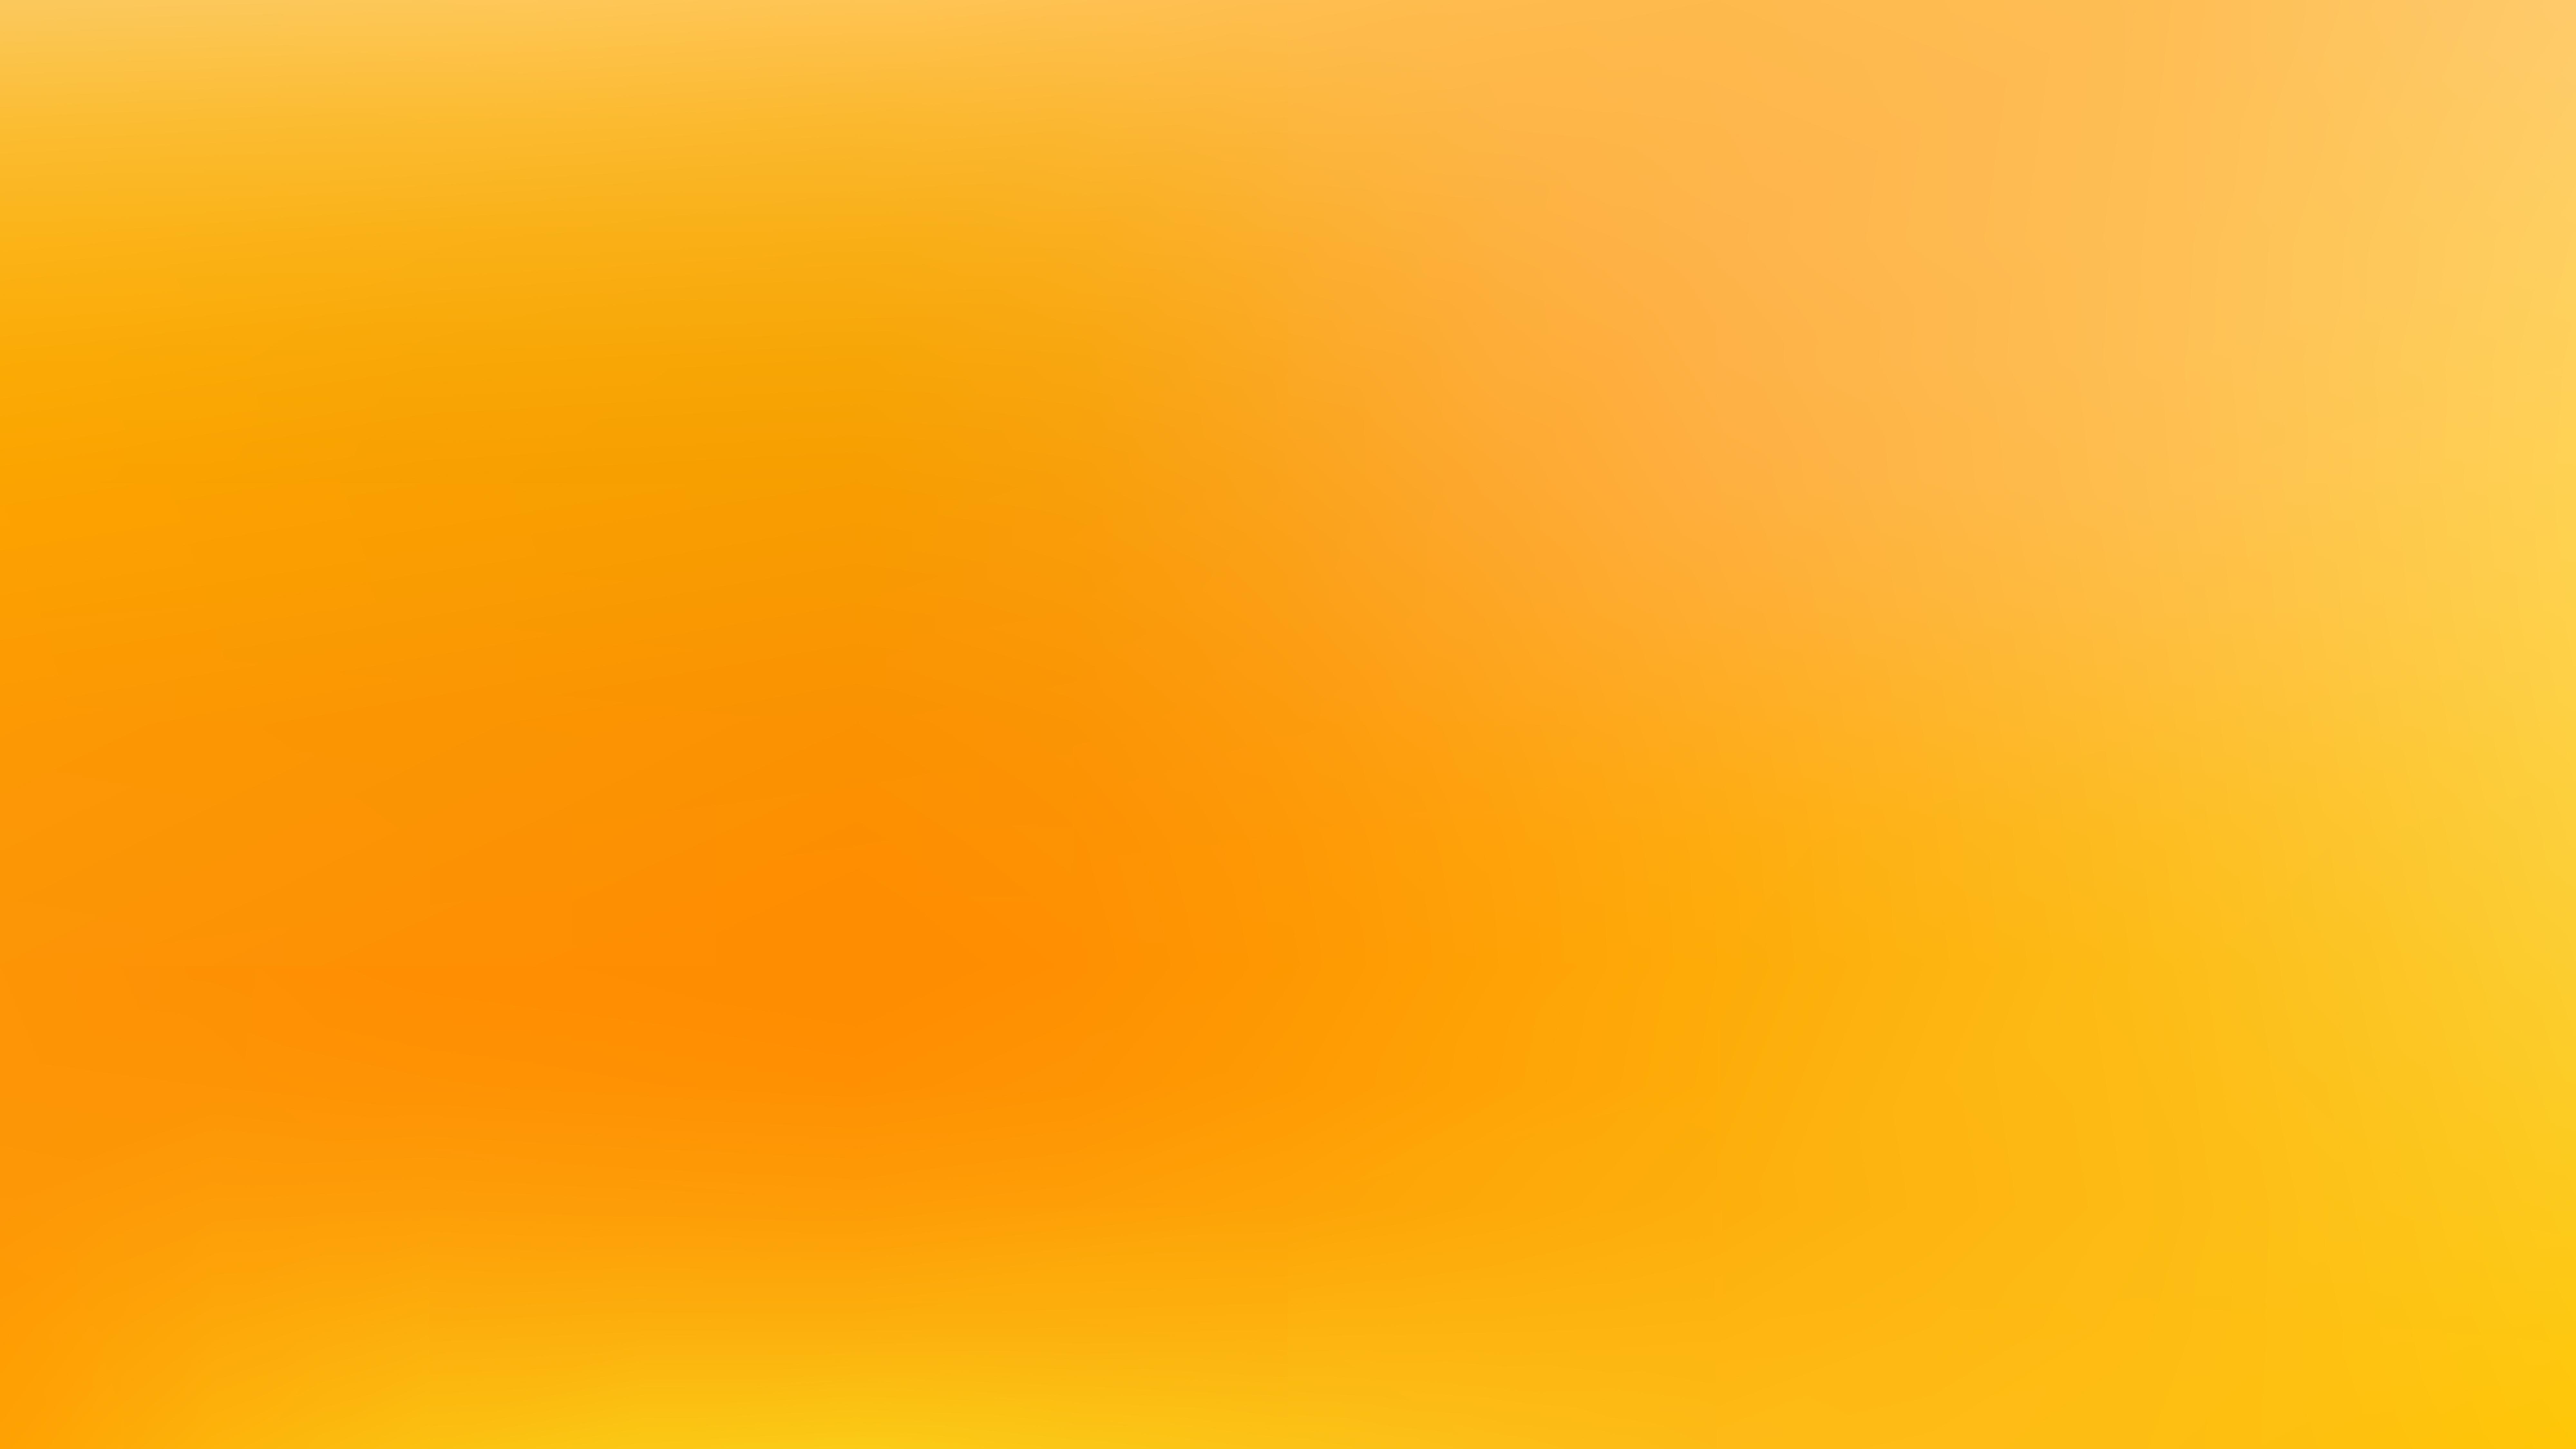 Free Orange And Yellow Presentation Background Design